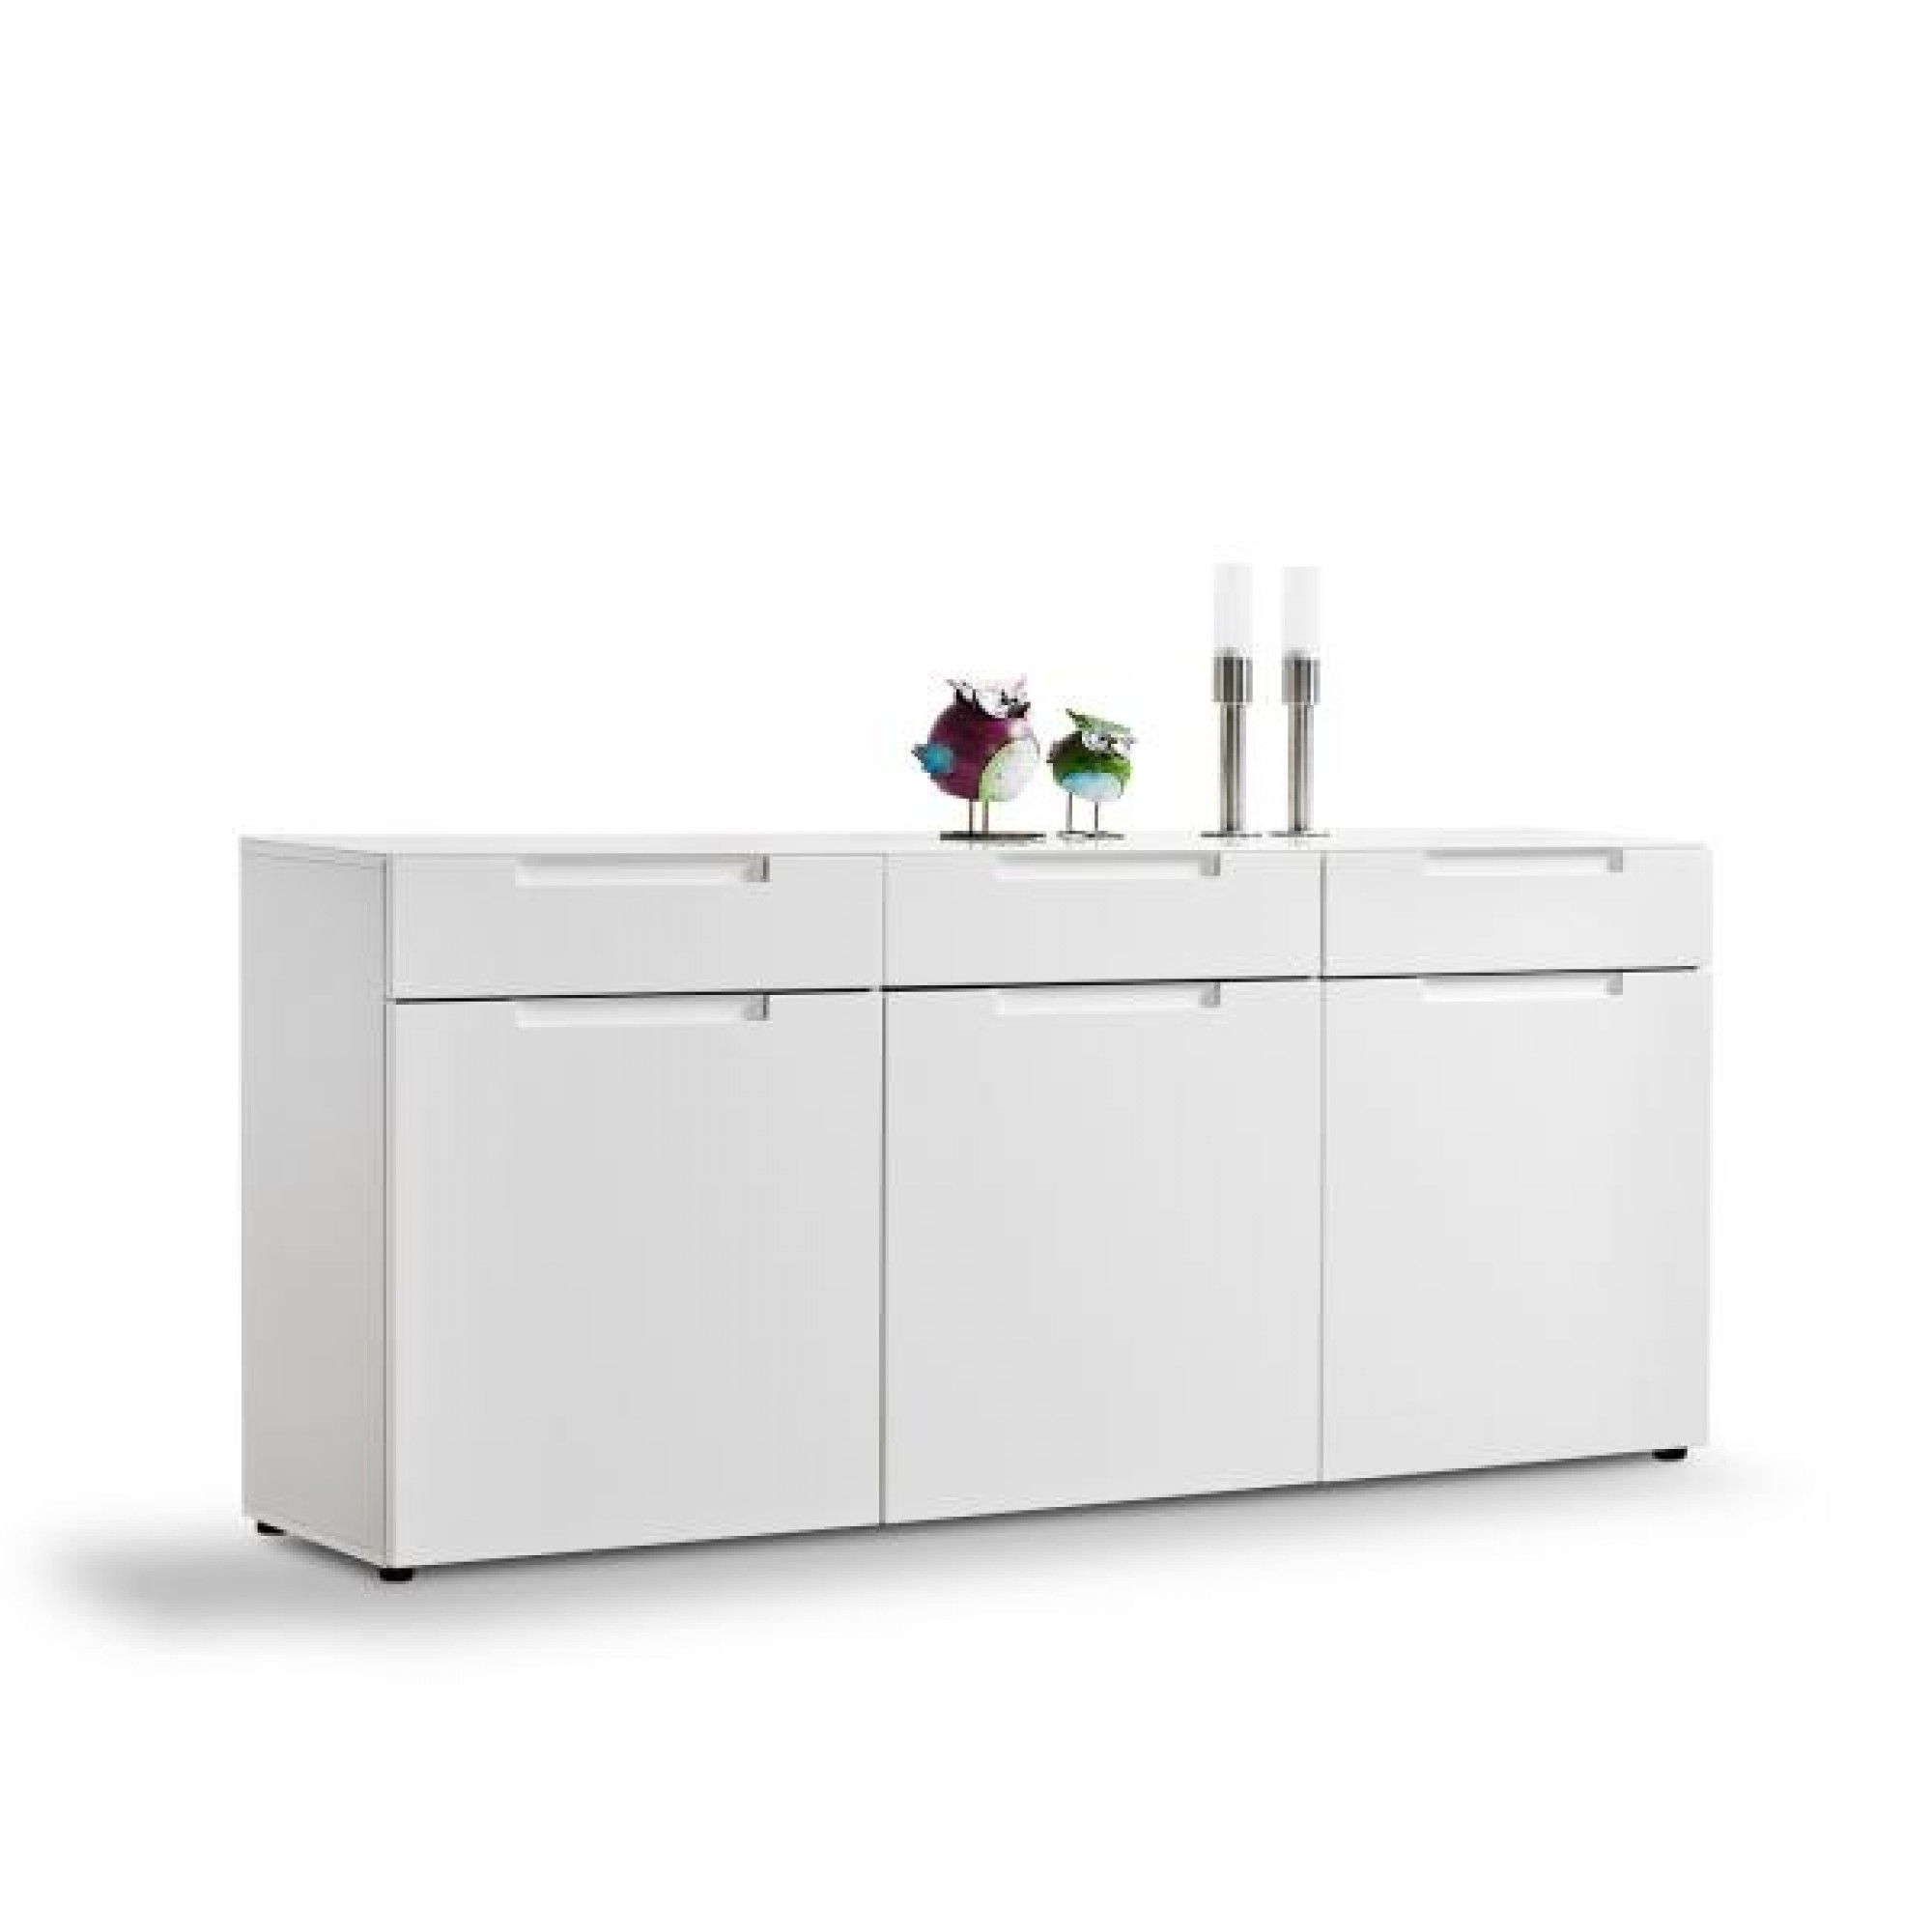 Sideboard Mailand Weiss Hochglanz Ca 192 X 83 Cm Hochglanz